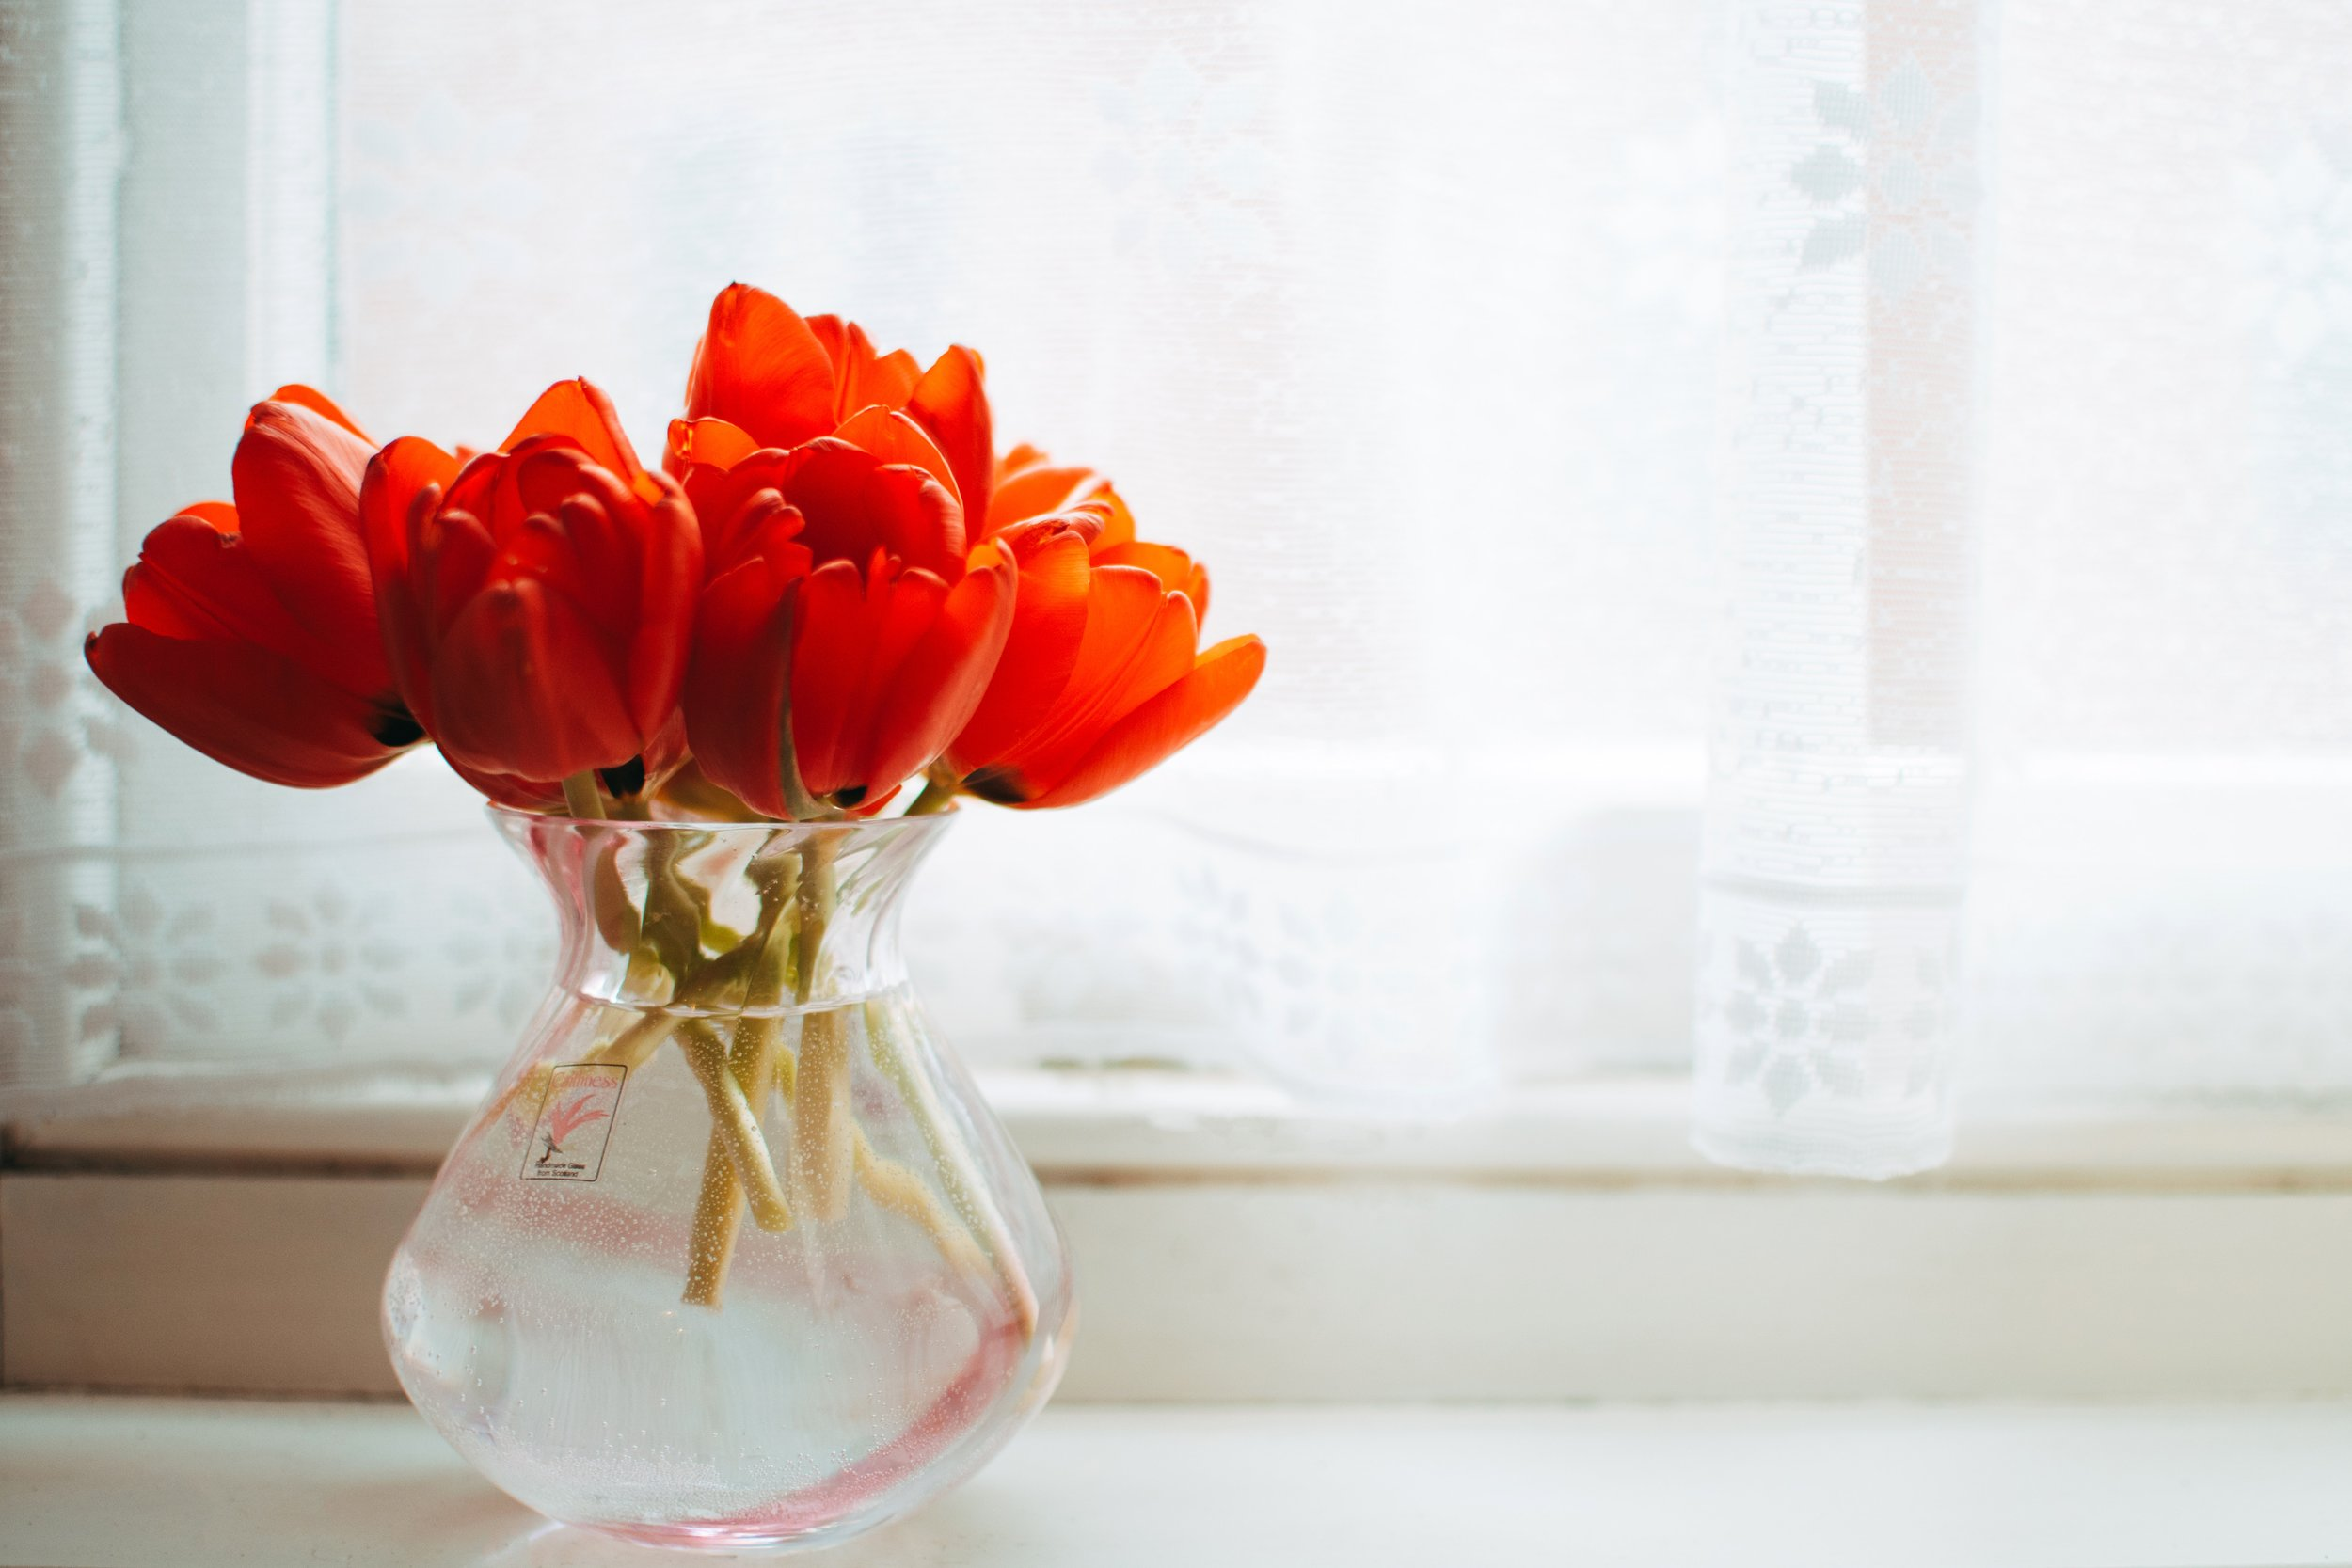 bouquet-bunch-of-flowers-color-858192.jpg